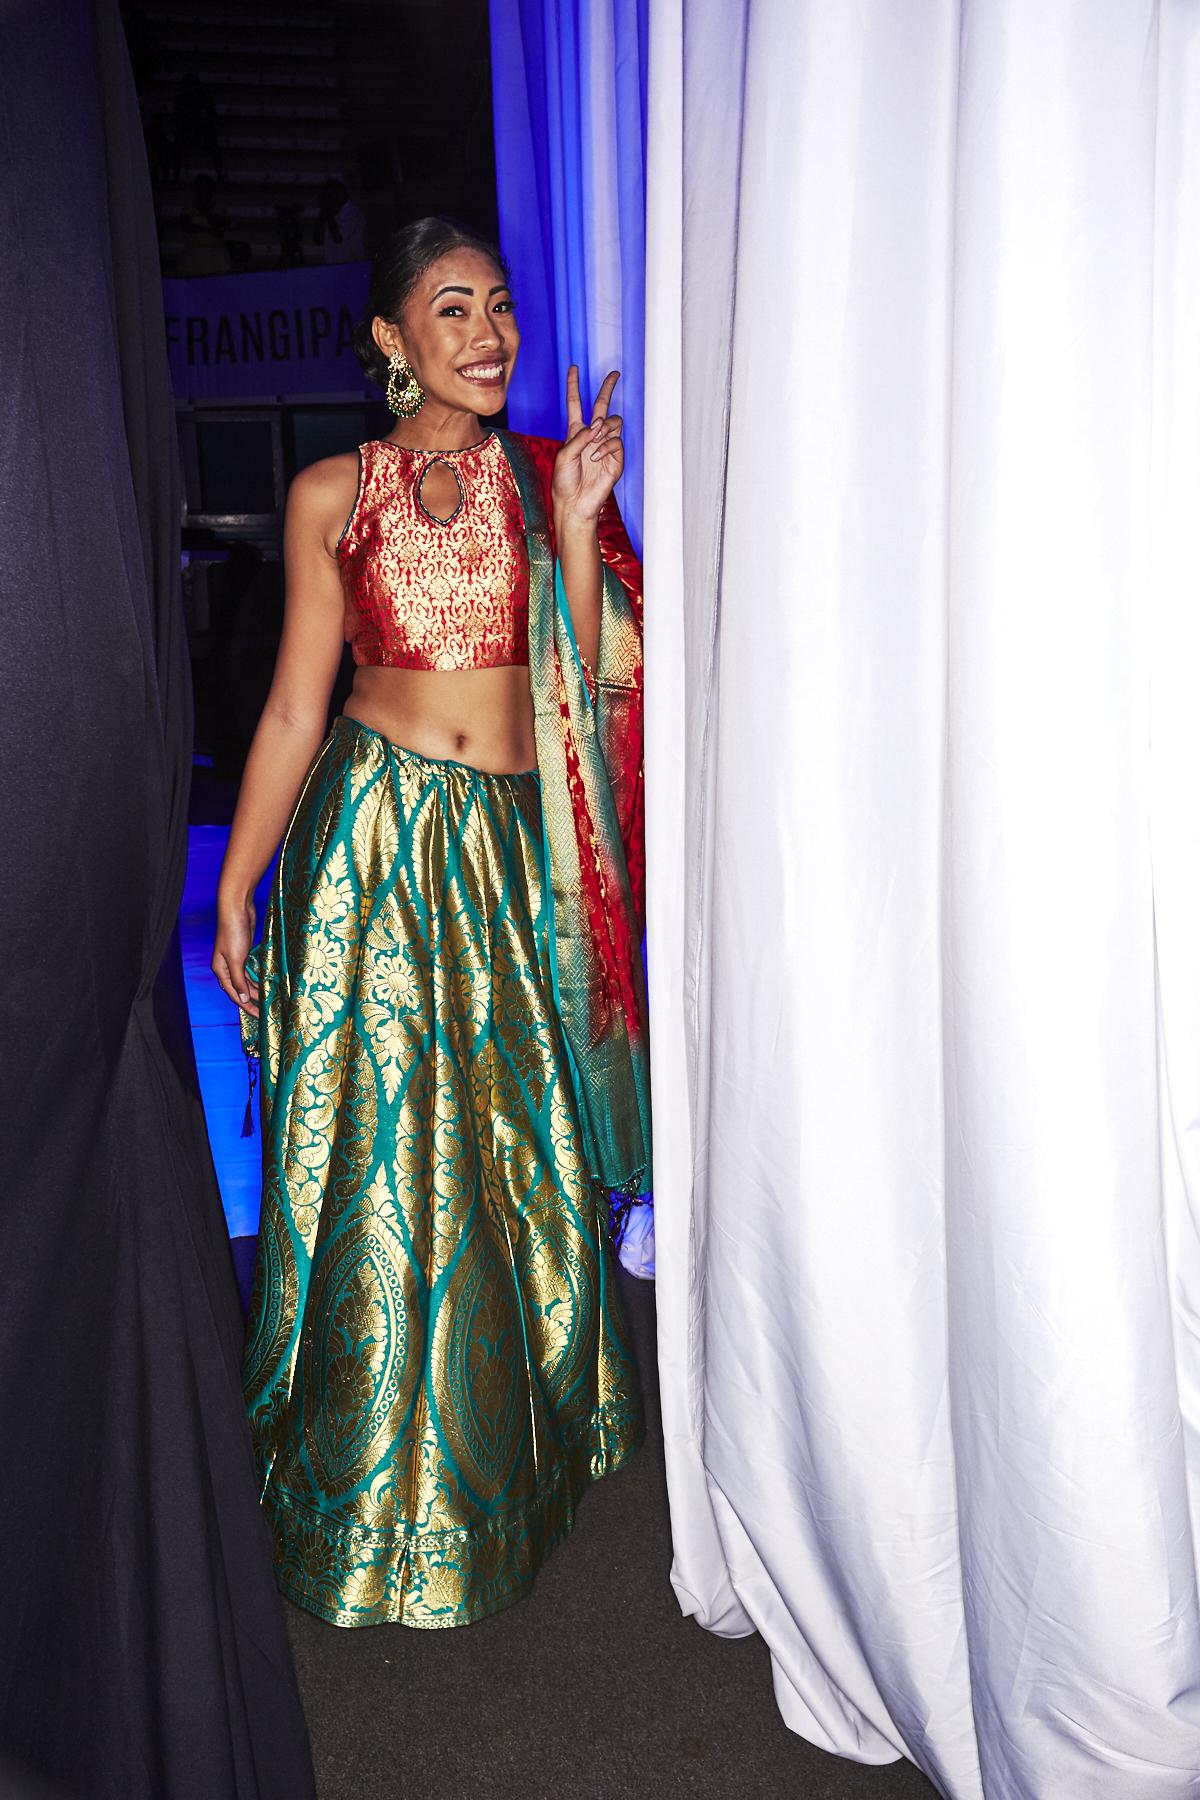 Style World by Yogita Khanna 2019 Fiji Cruise Resort Show Backstage Suva